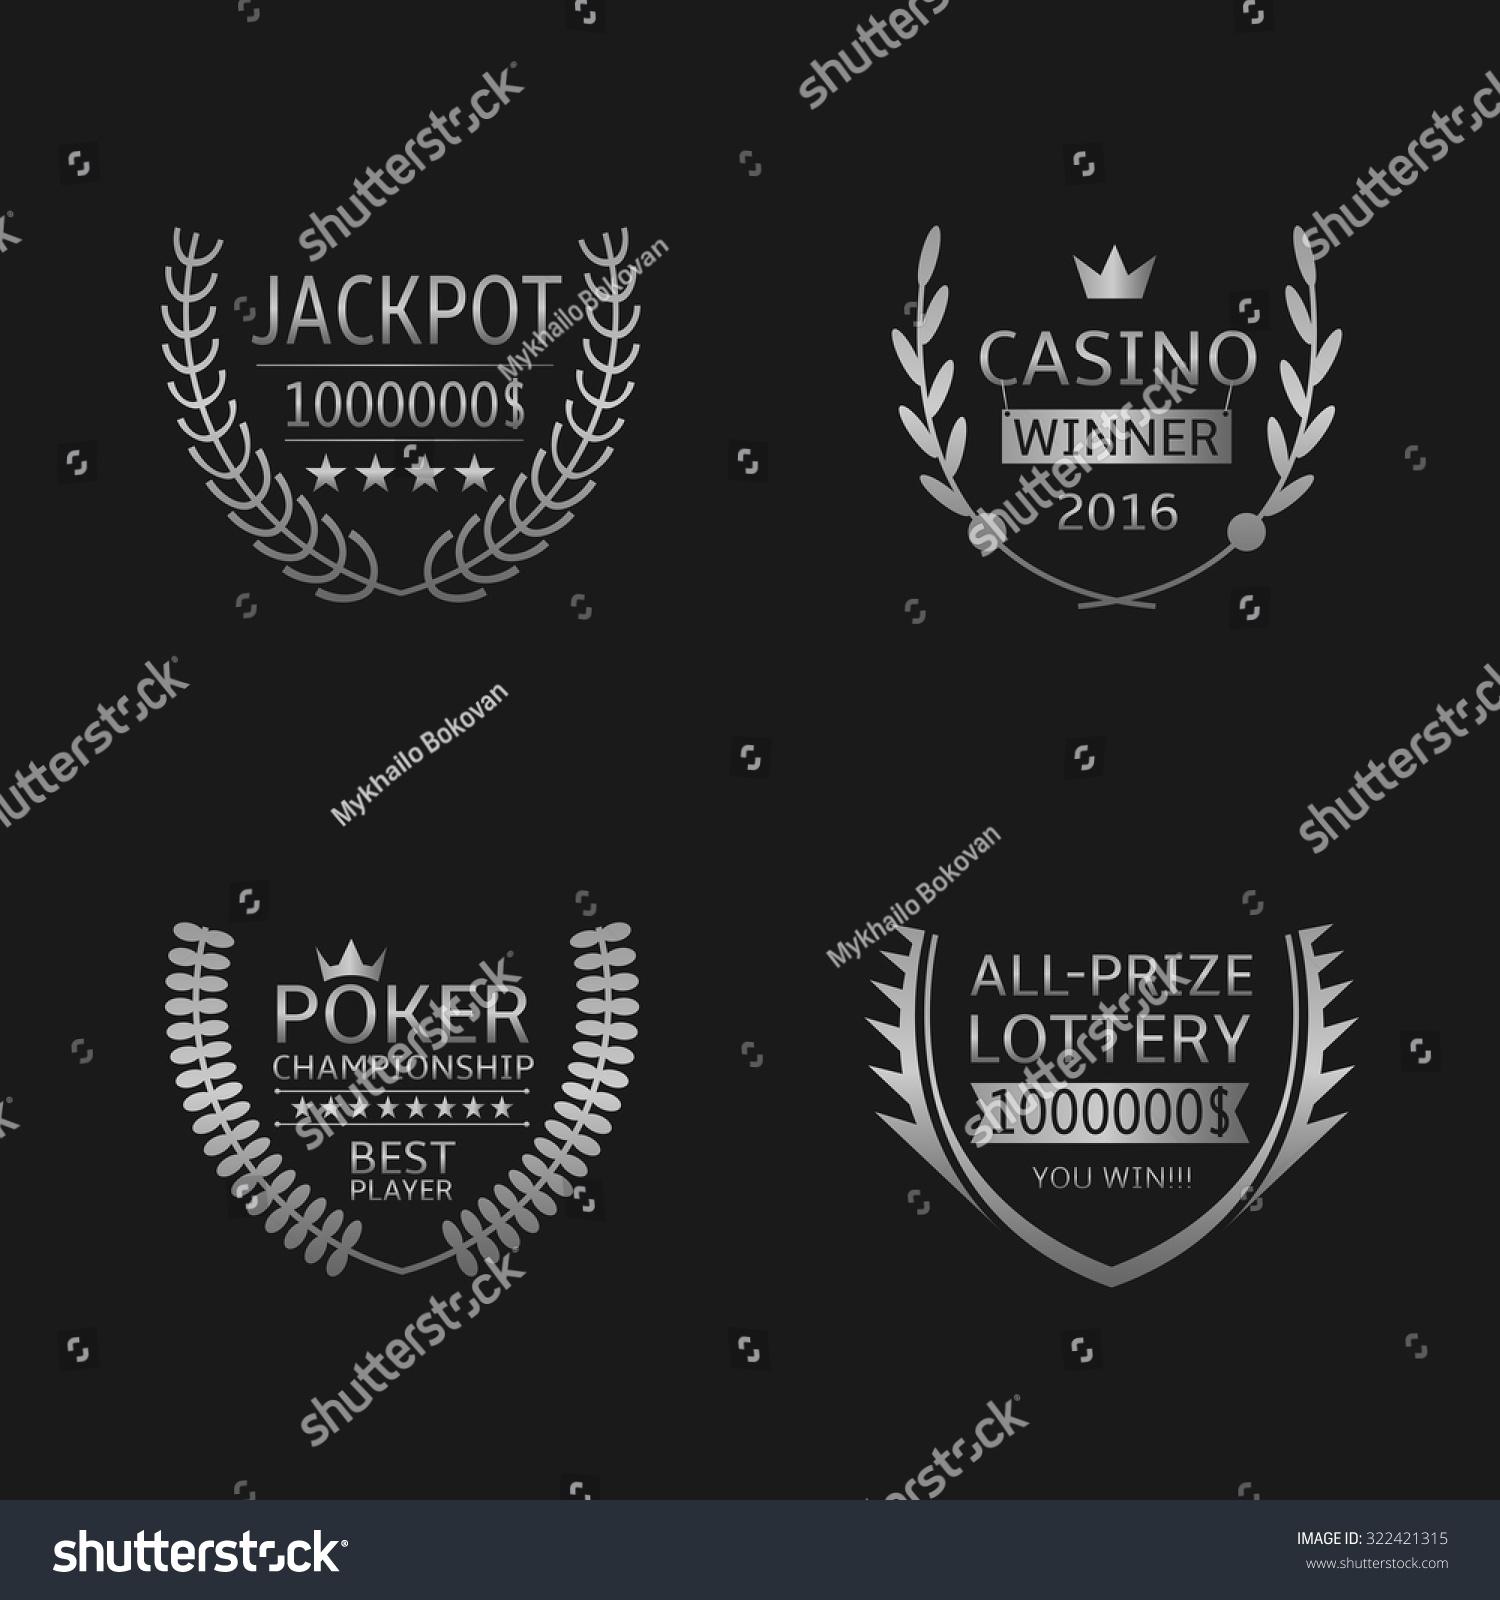 online casino auszahlung faust symbol